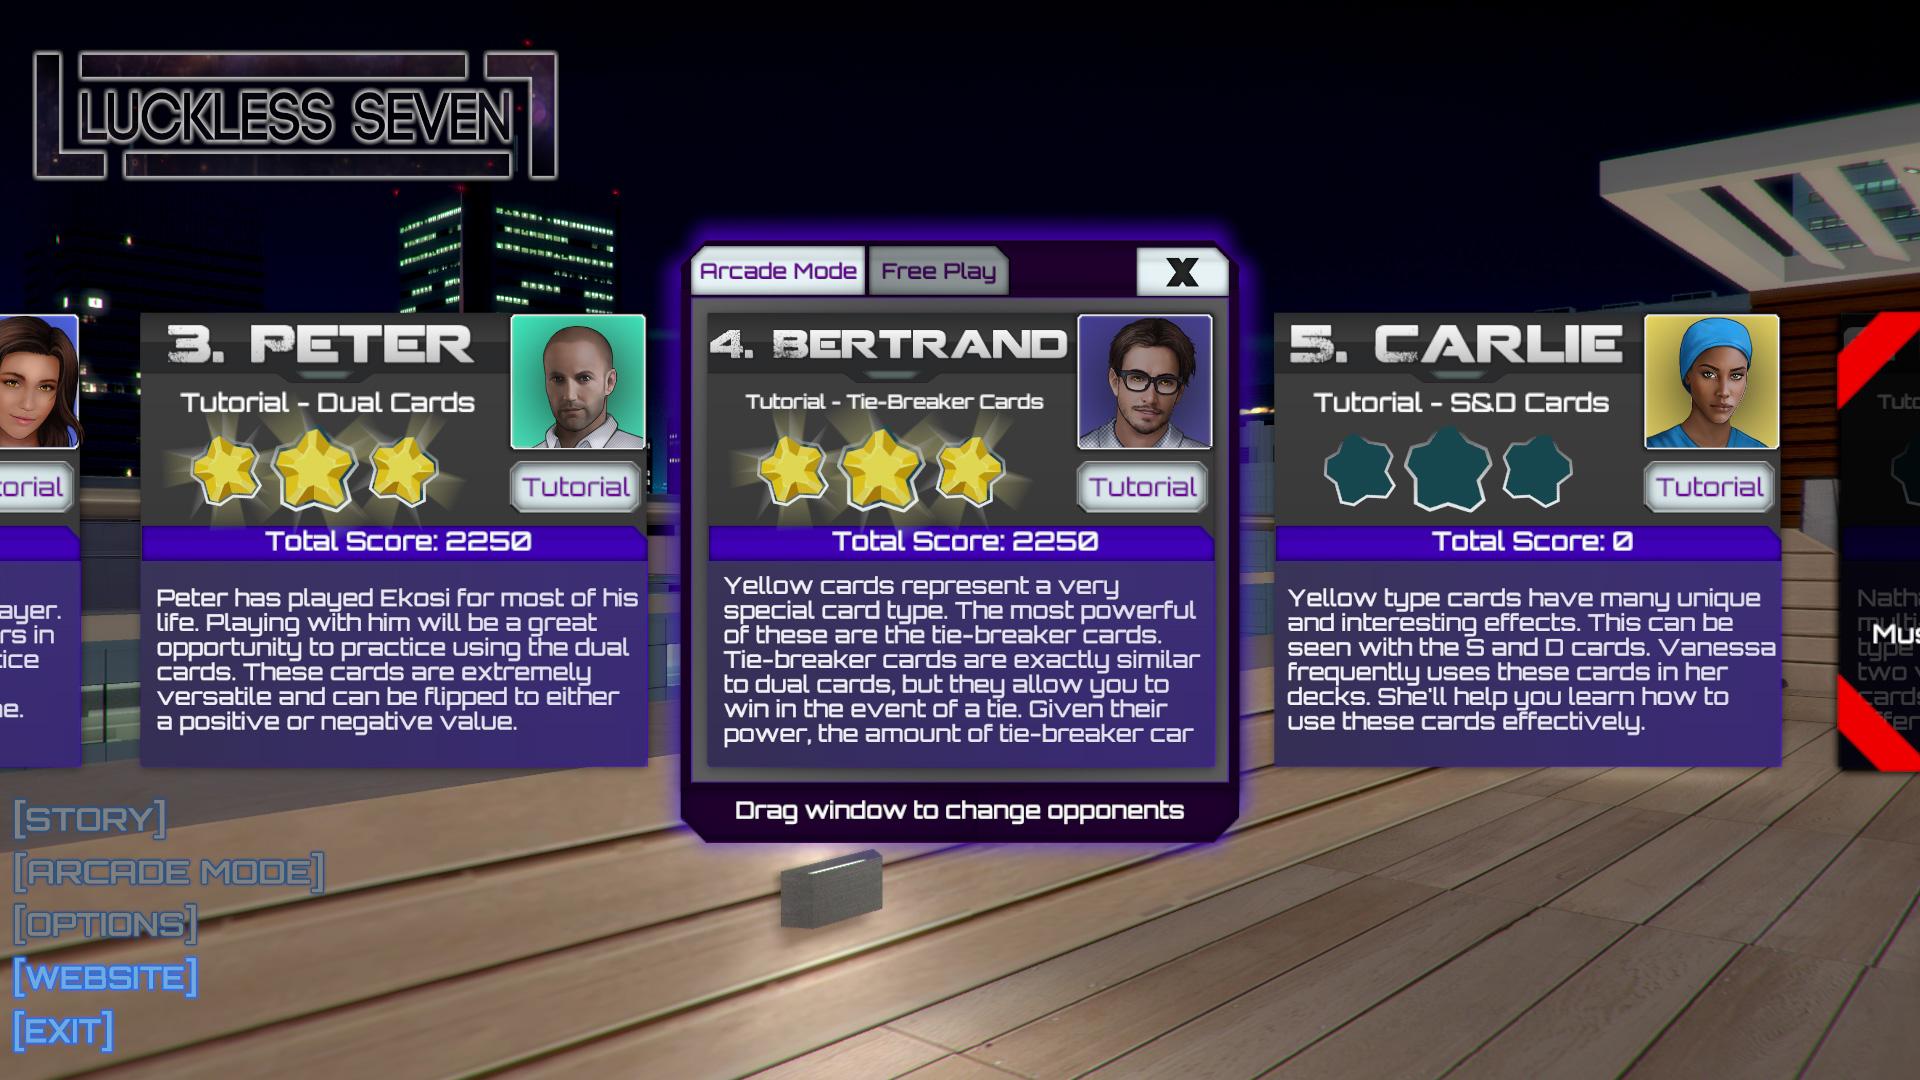 City 2 Preview Luckless Seven Arcade Mode